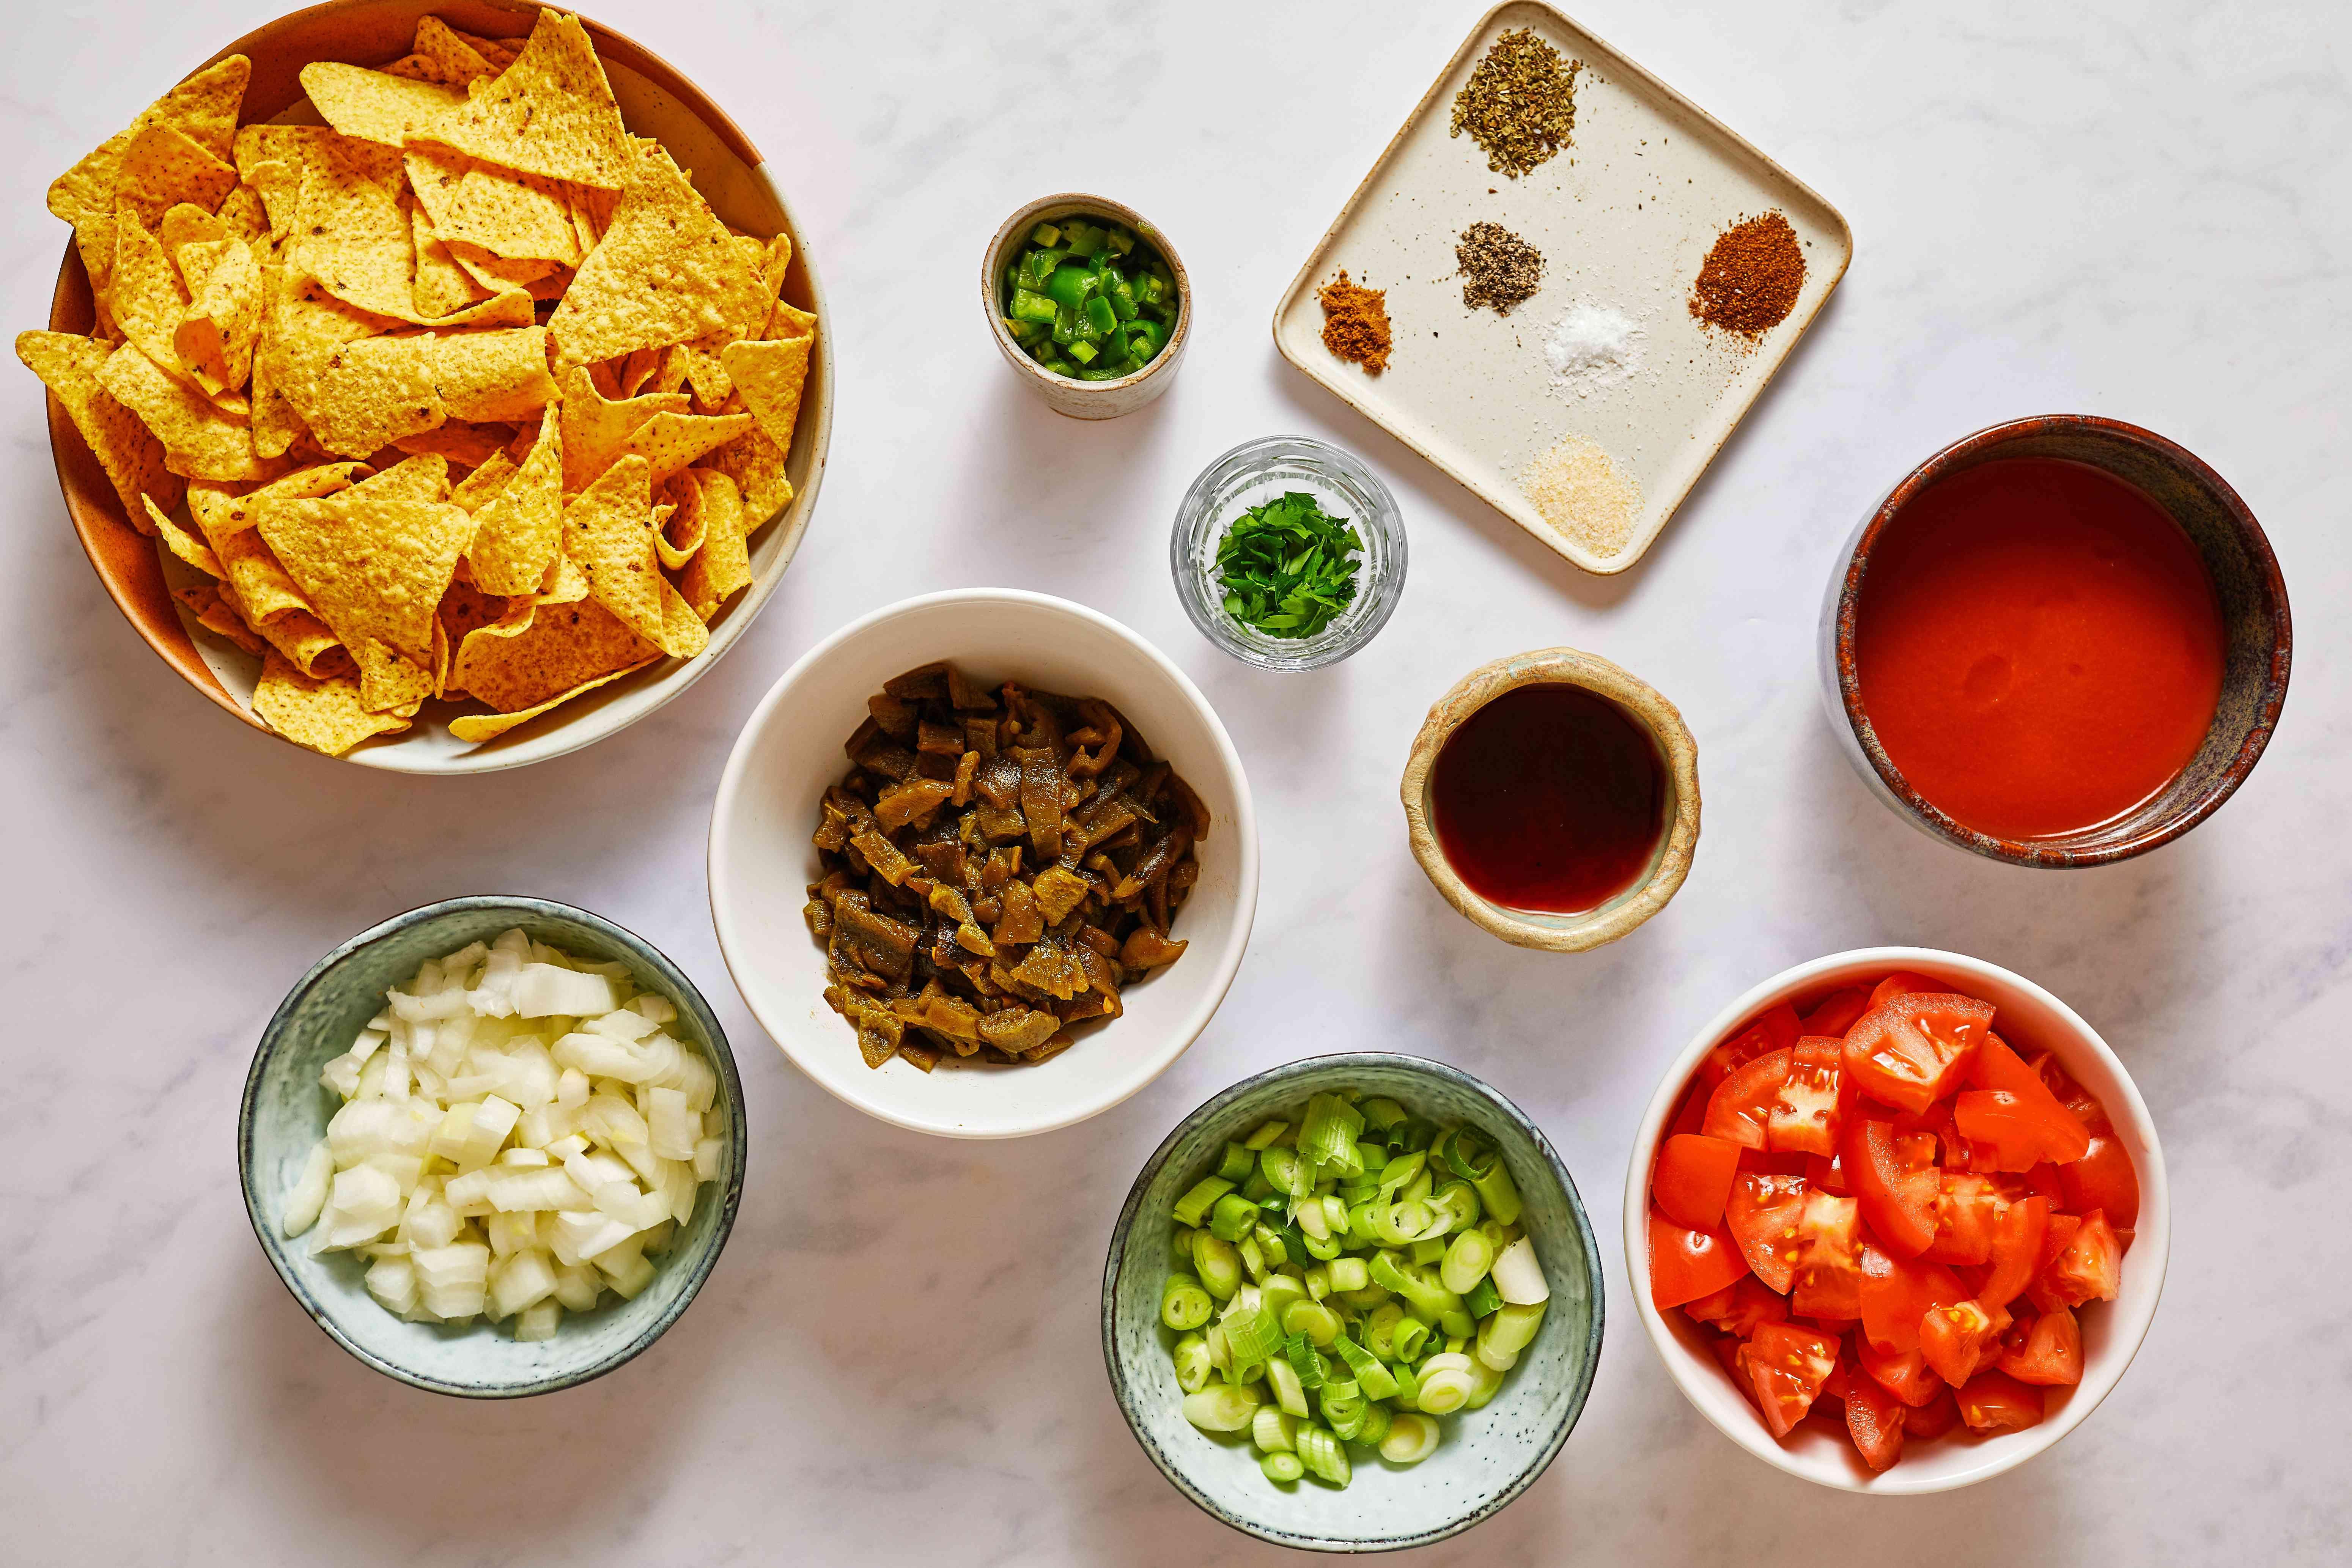 Chunky Homemade Salsa ingredients